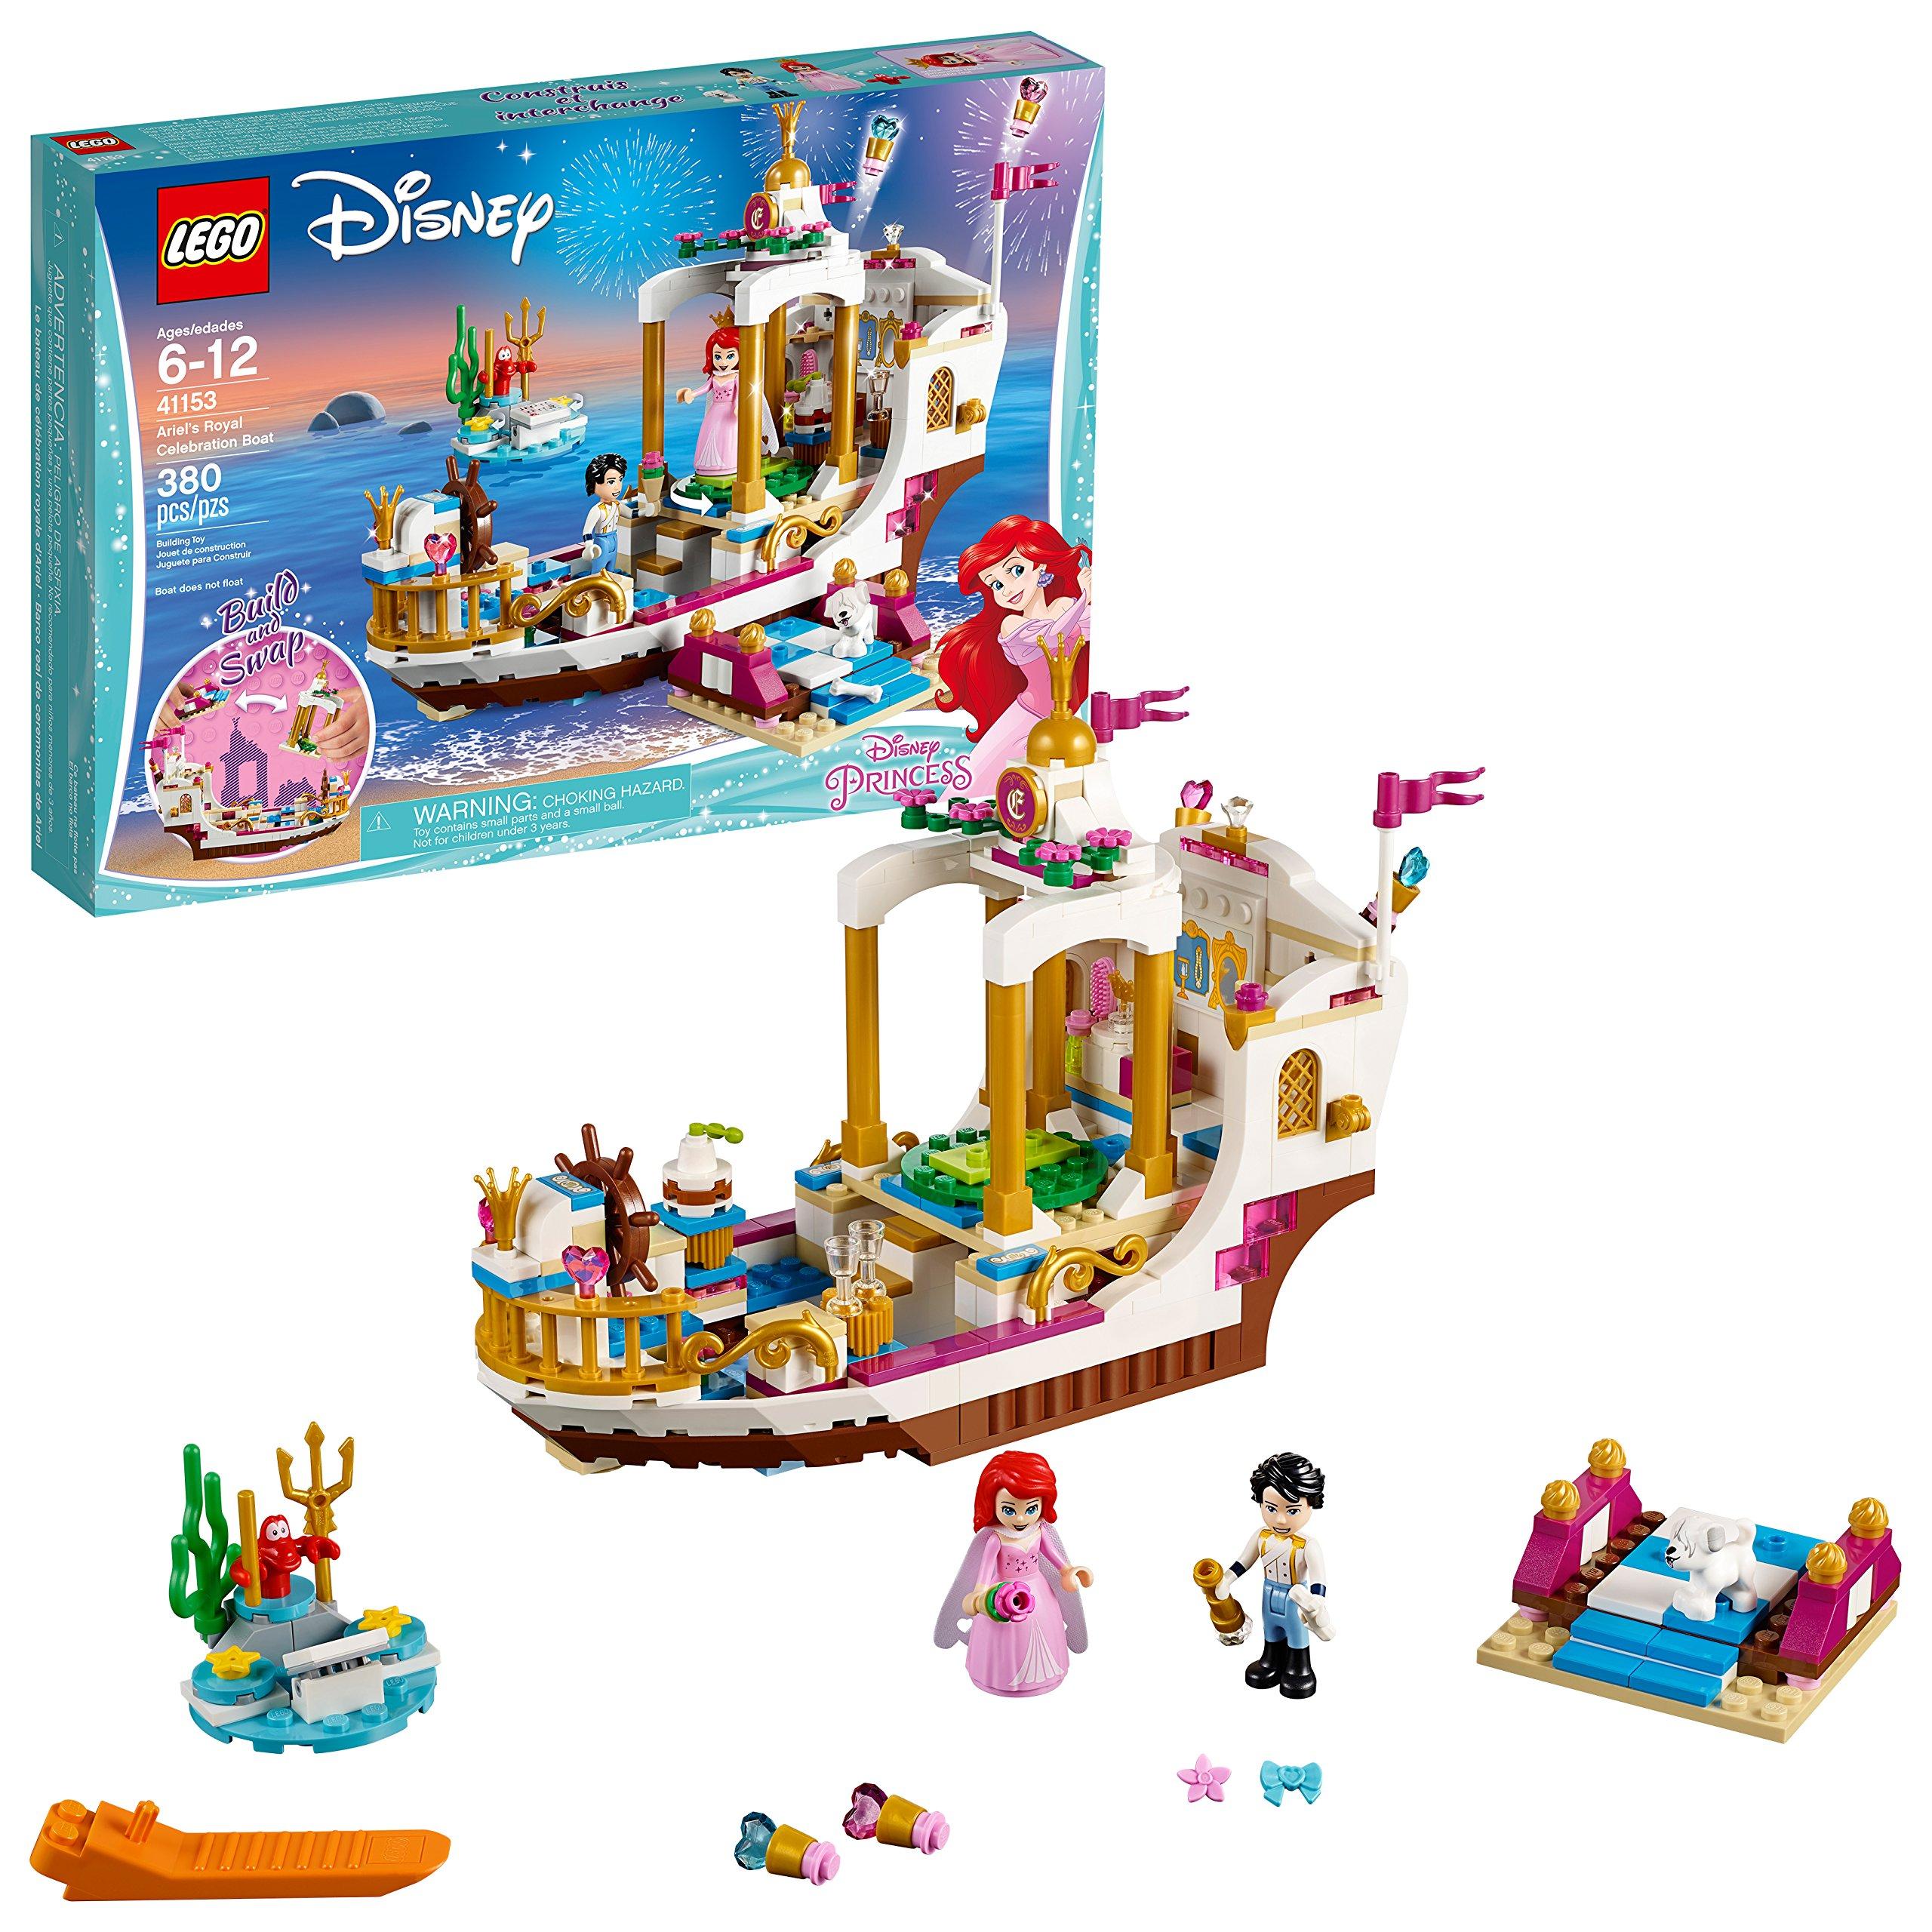 LEGO Disney Princess Ariel's Royal Celebration Boat 41153 Children's Toy Construction Set